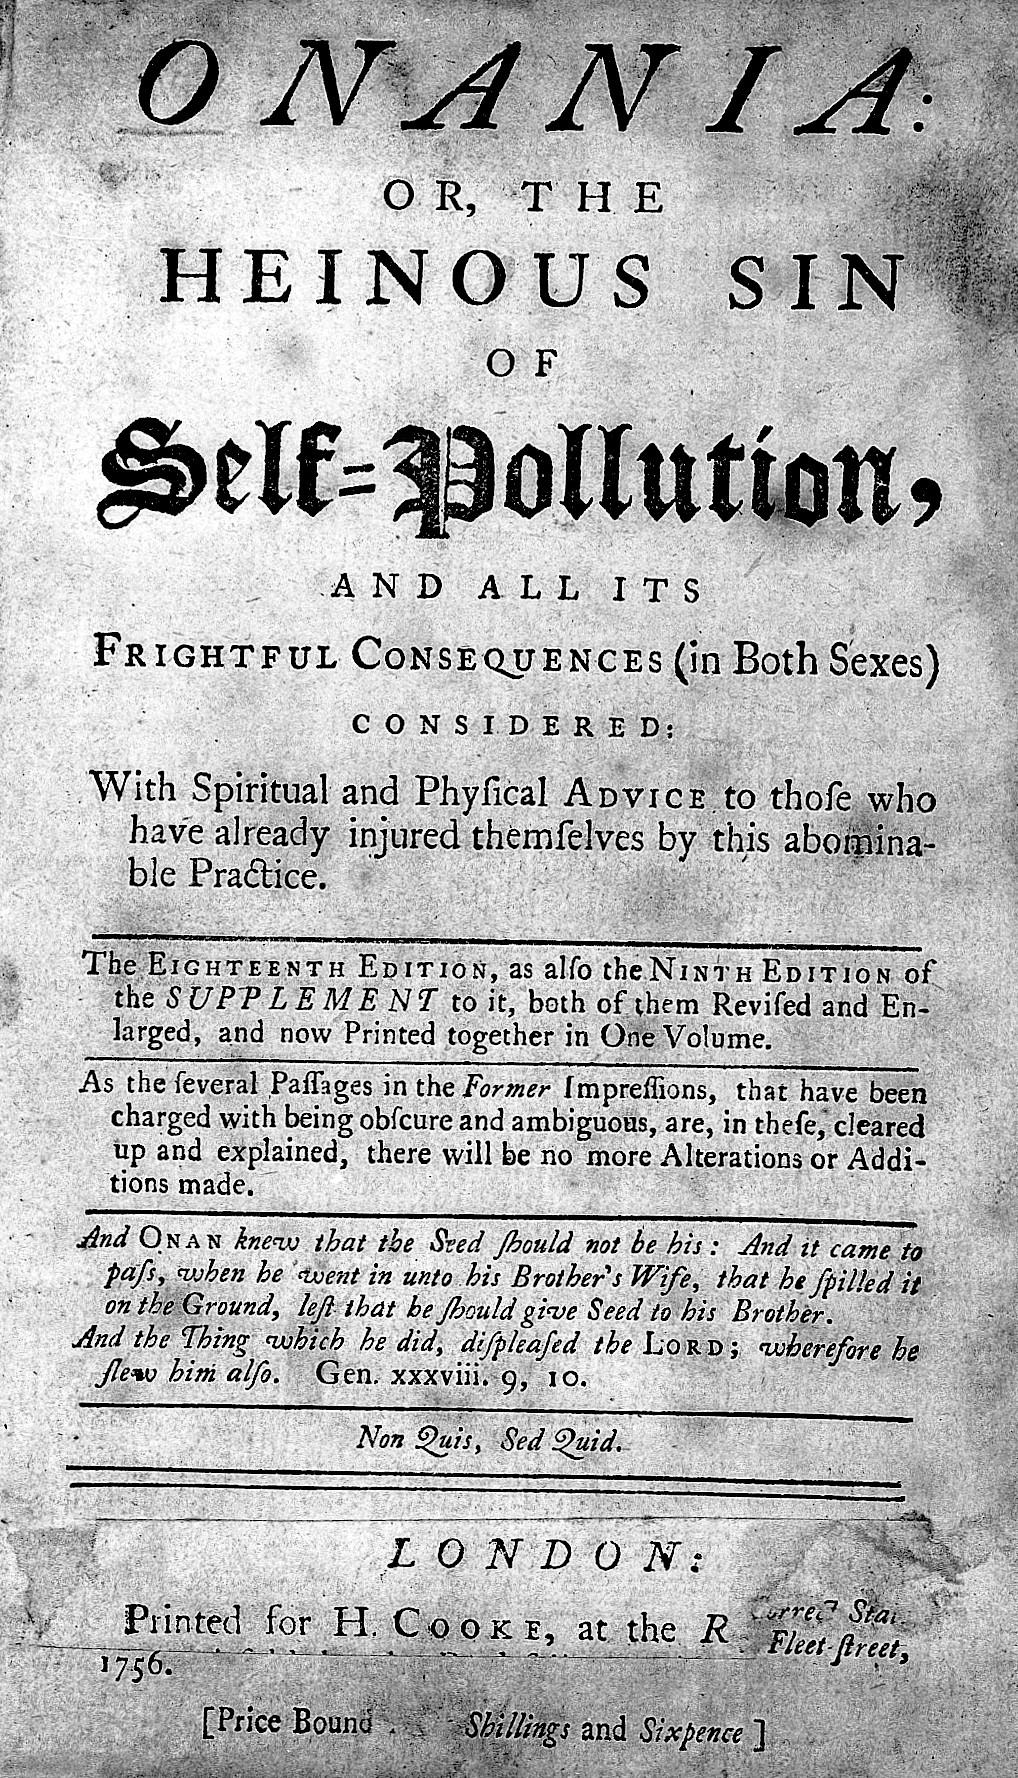 https://upload.wikimedia.org/wikipedia/commons/2/24/Onania%3B_or,_the_Heinous_sin_of_Self-Pollution._Wellcome_L0025077.jpg